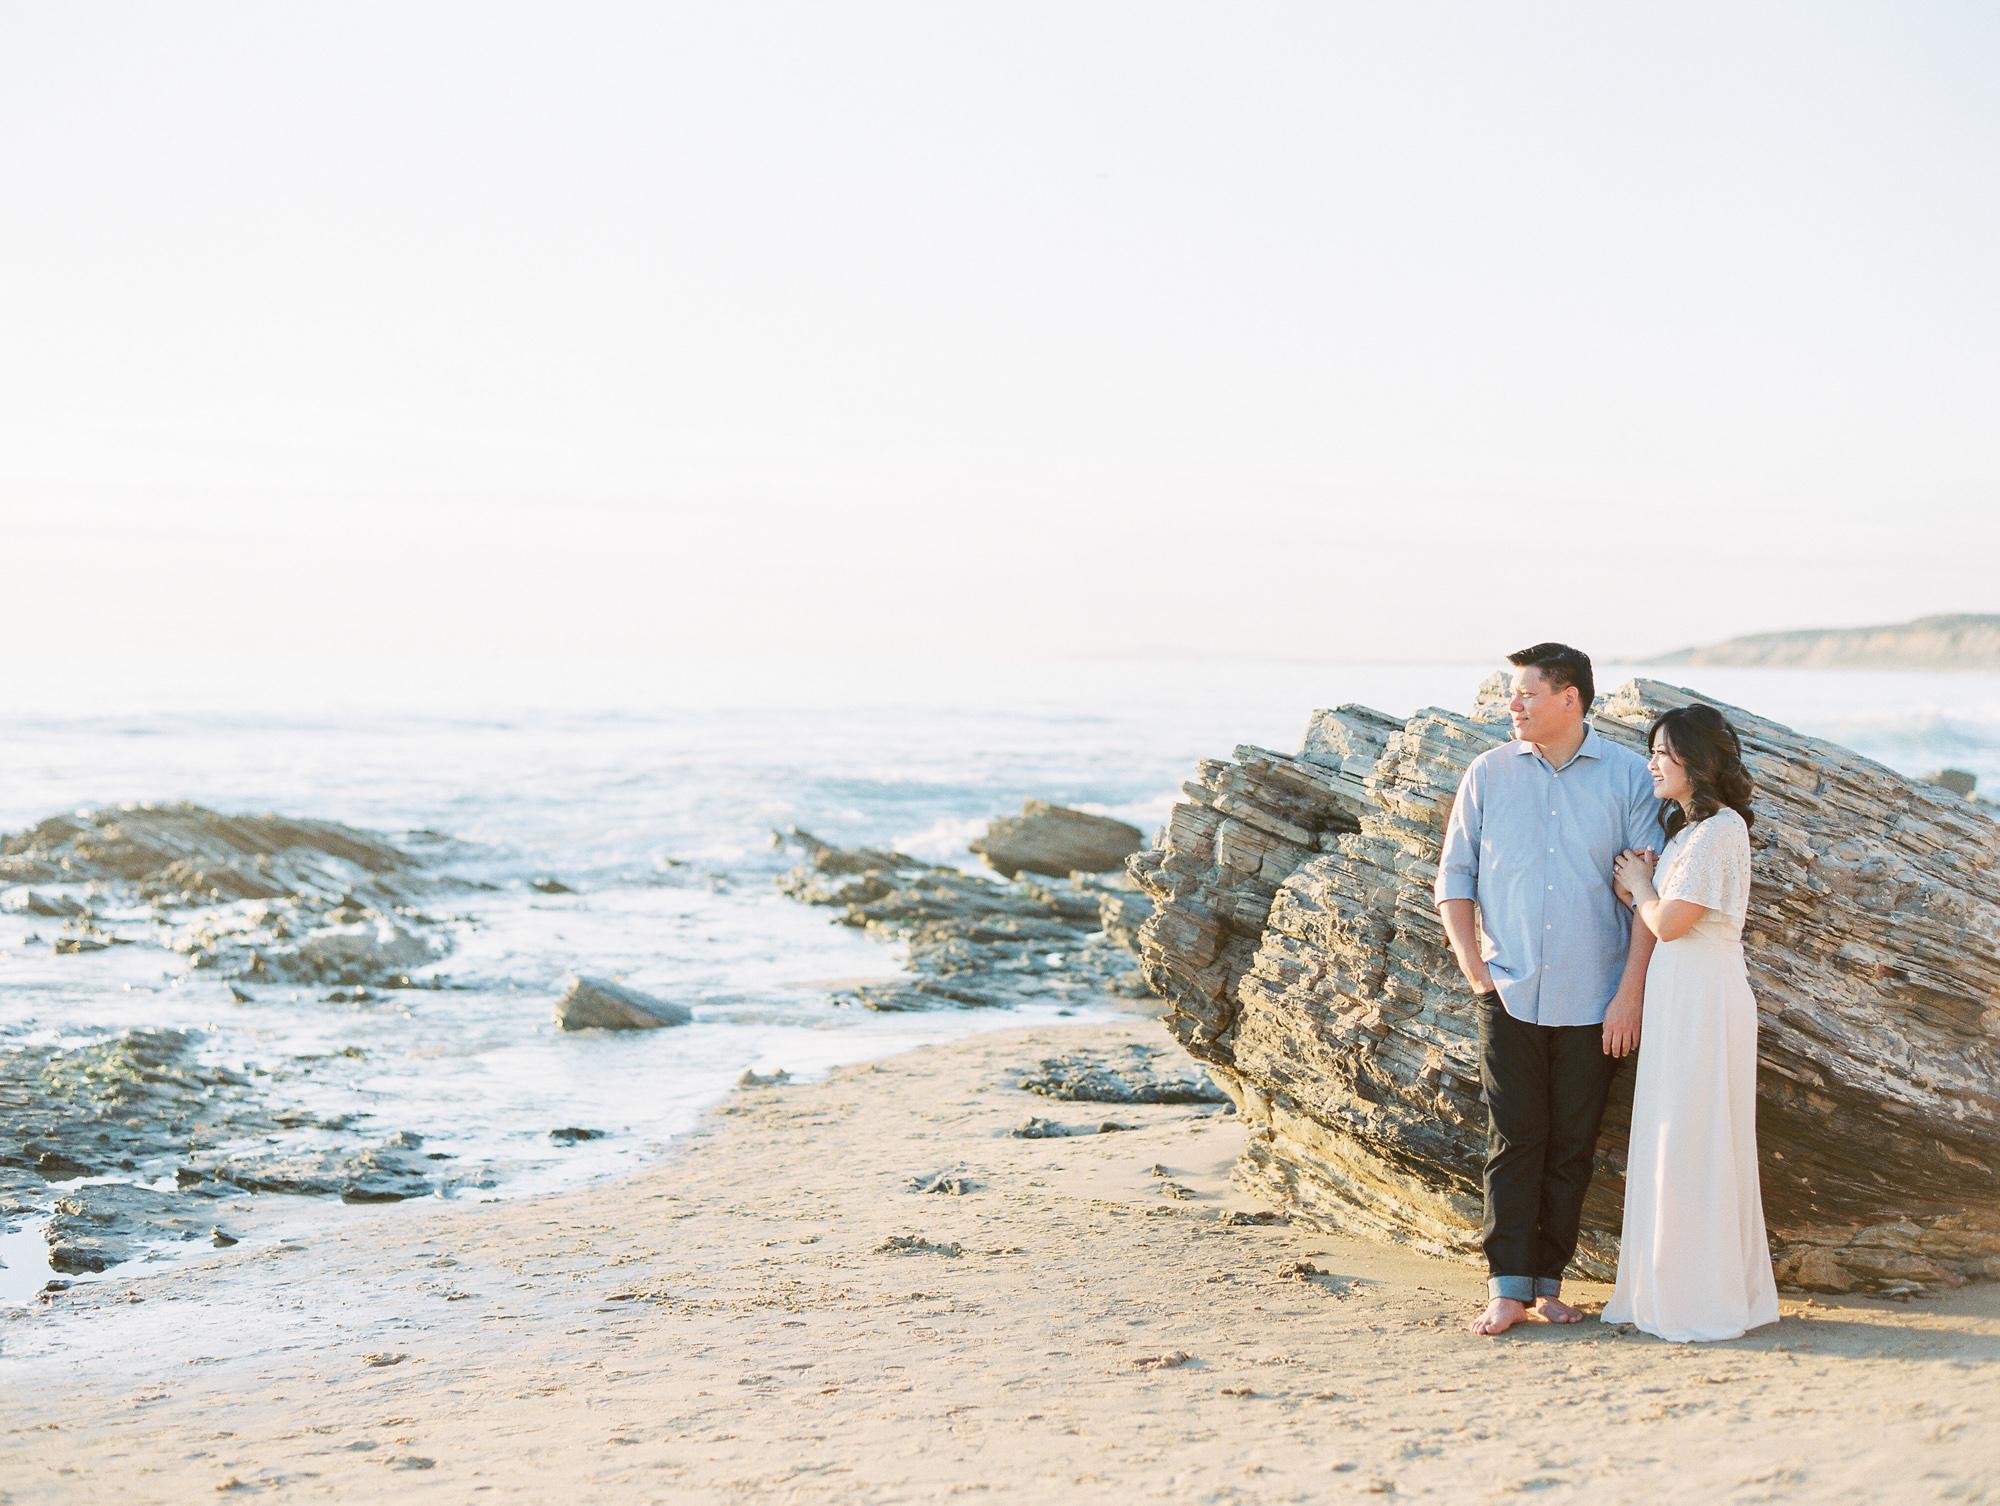 Crystal-Cove-Engagement-Kristina-Adams-14.jpg